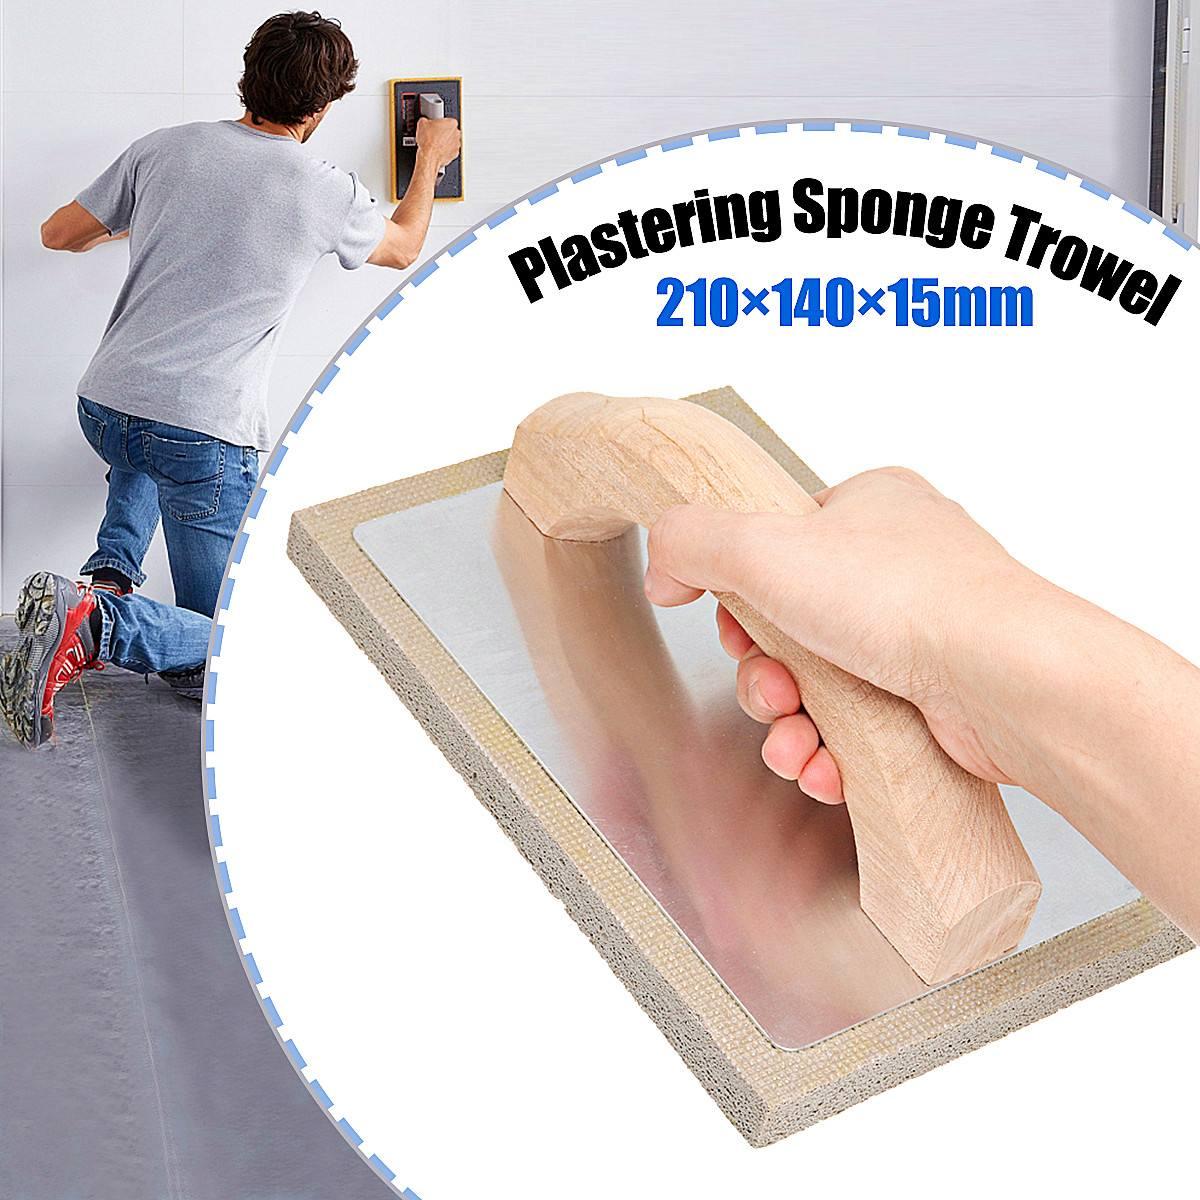 210x140x15mm Plaster Plastering Sponge Trowel Ergonomic Handle Design For Wall Plastering, Professional Caulking Tools